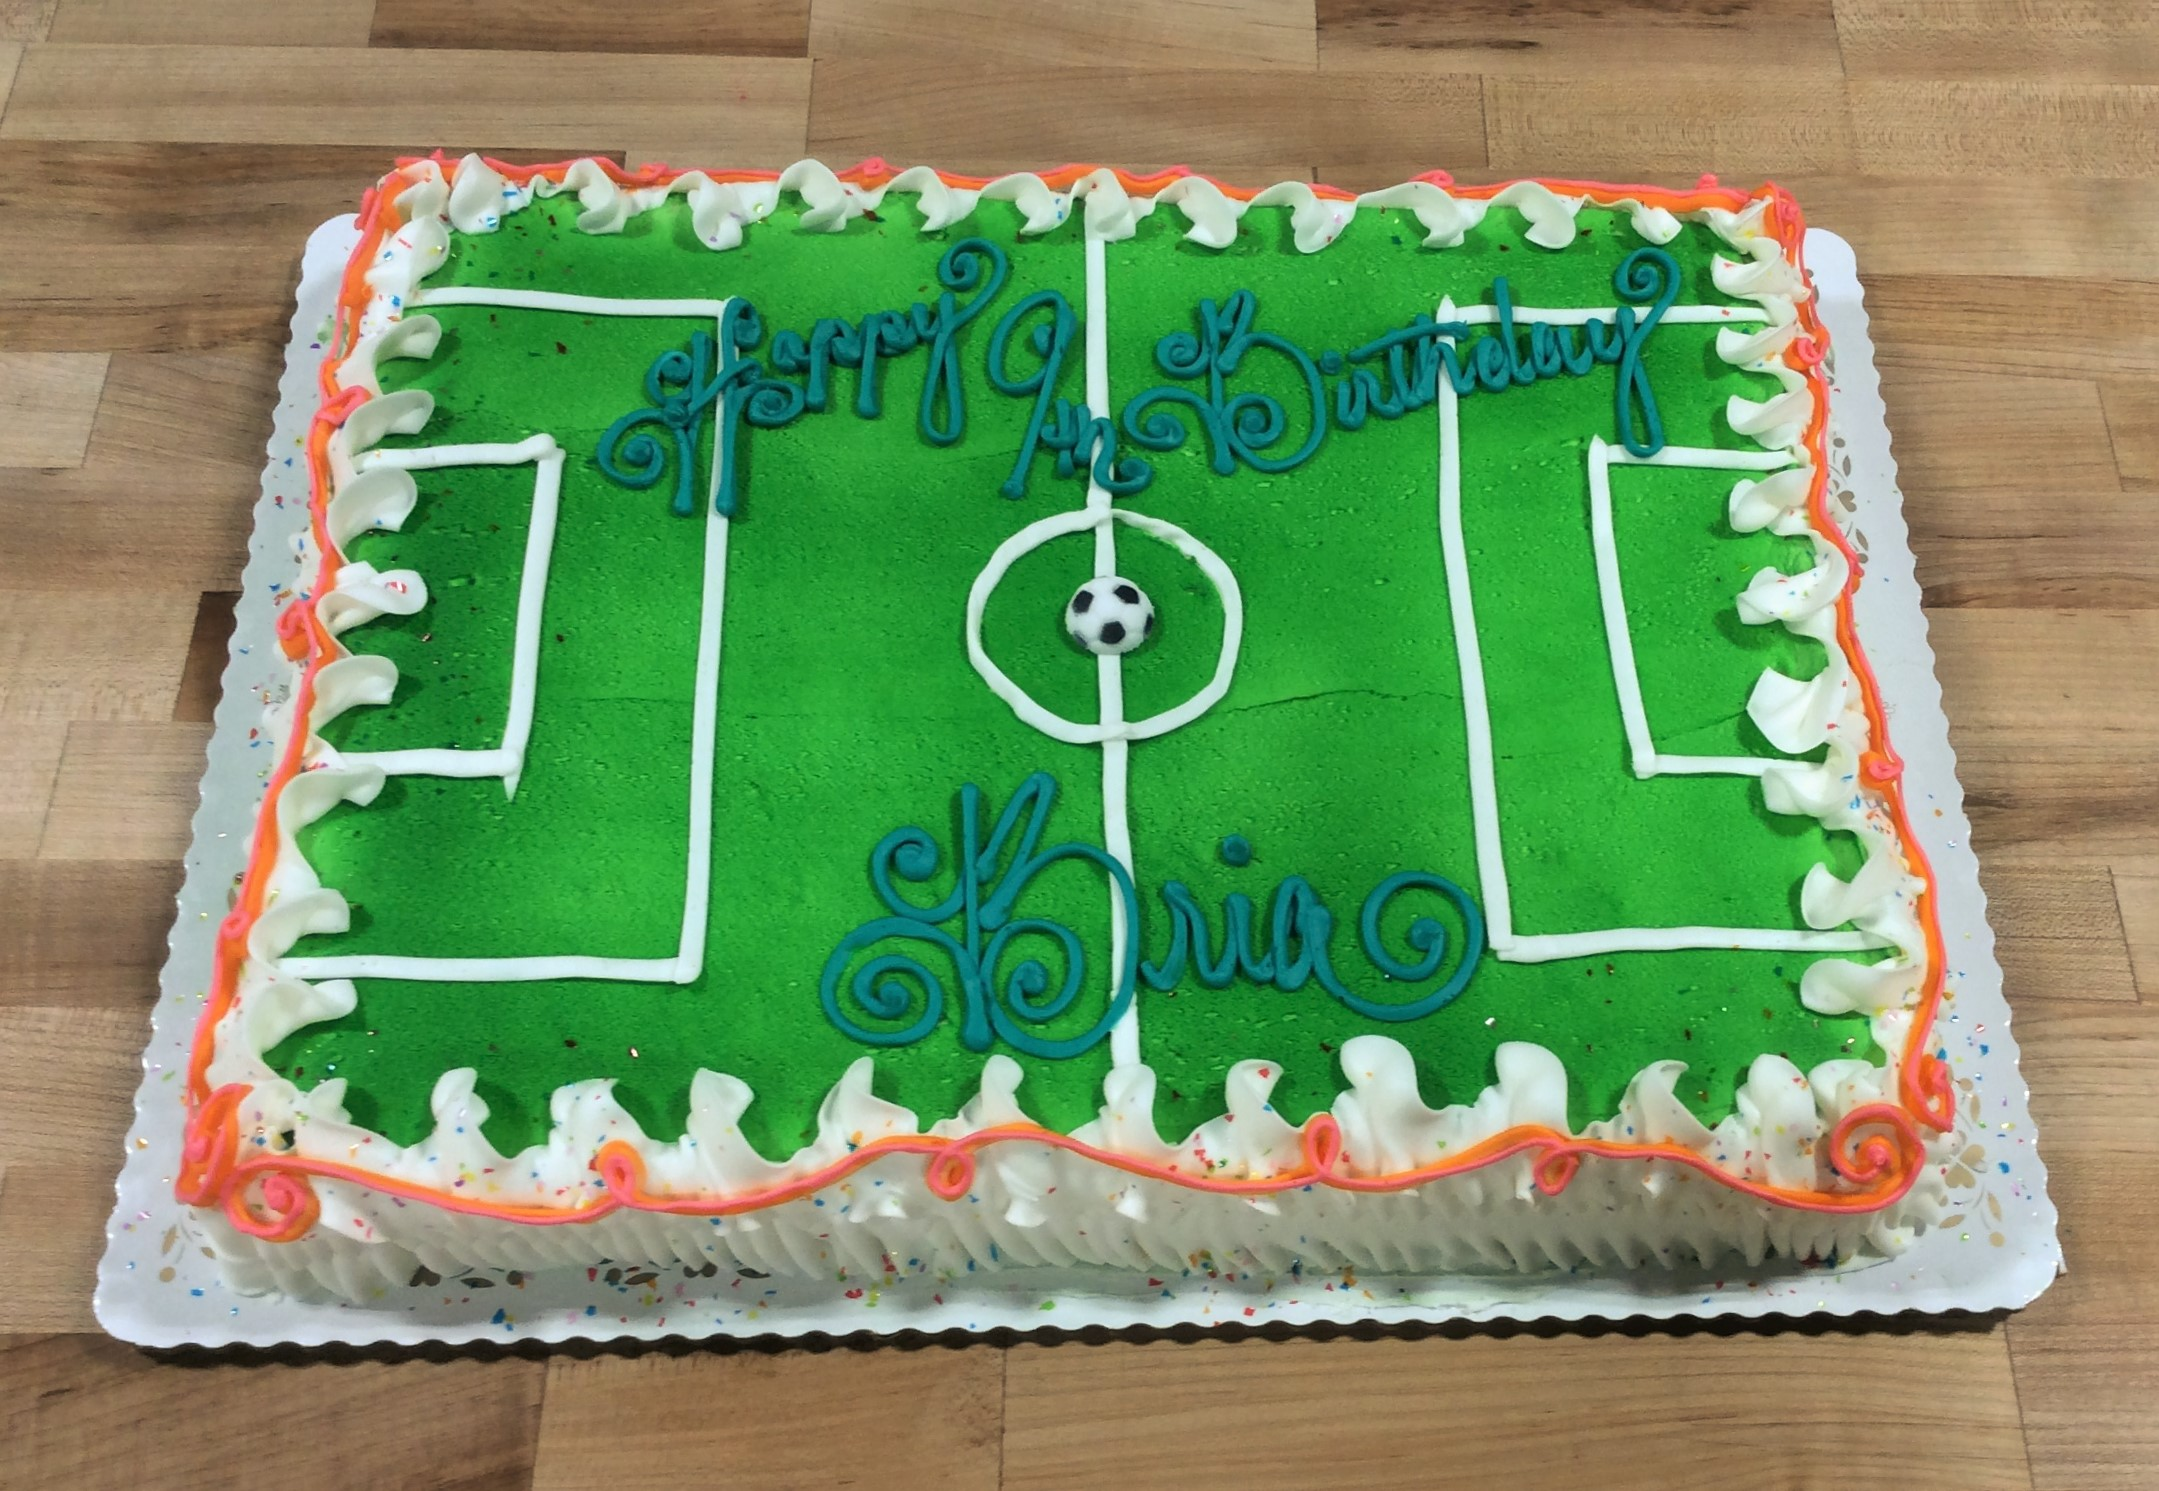 Sheet Cake with Sprayed Soccer Field